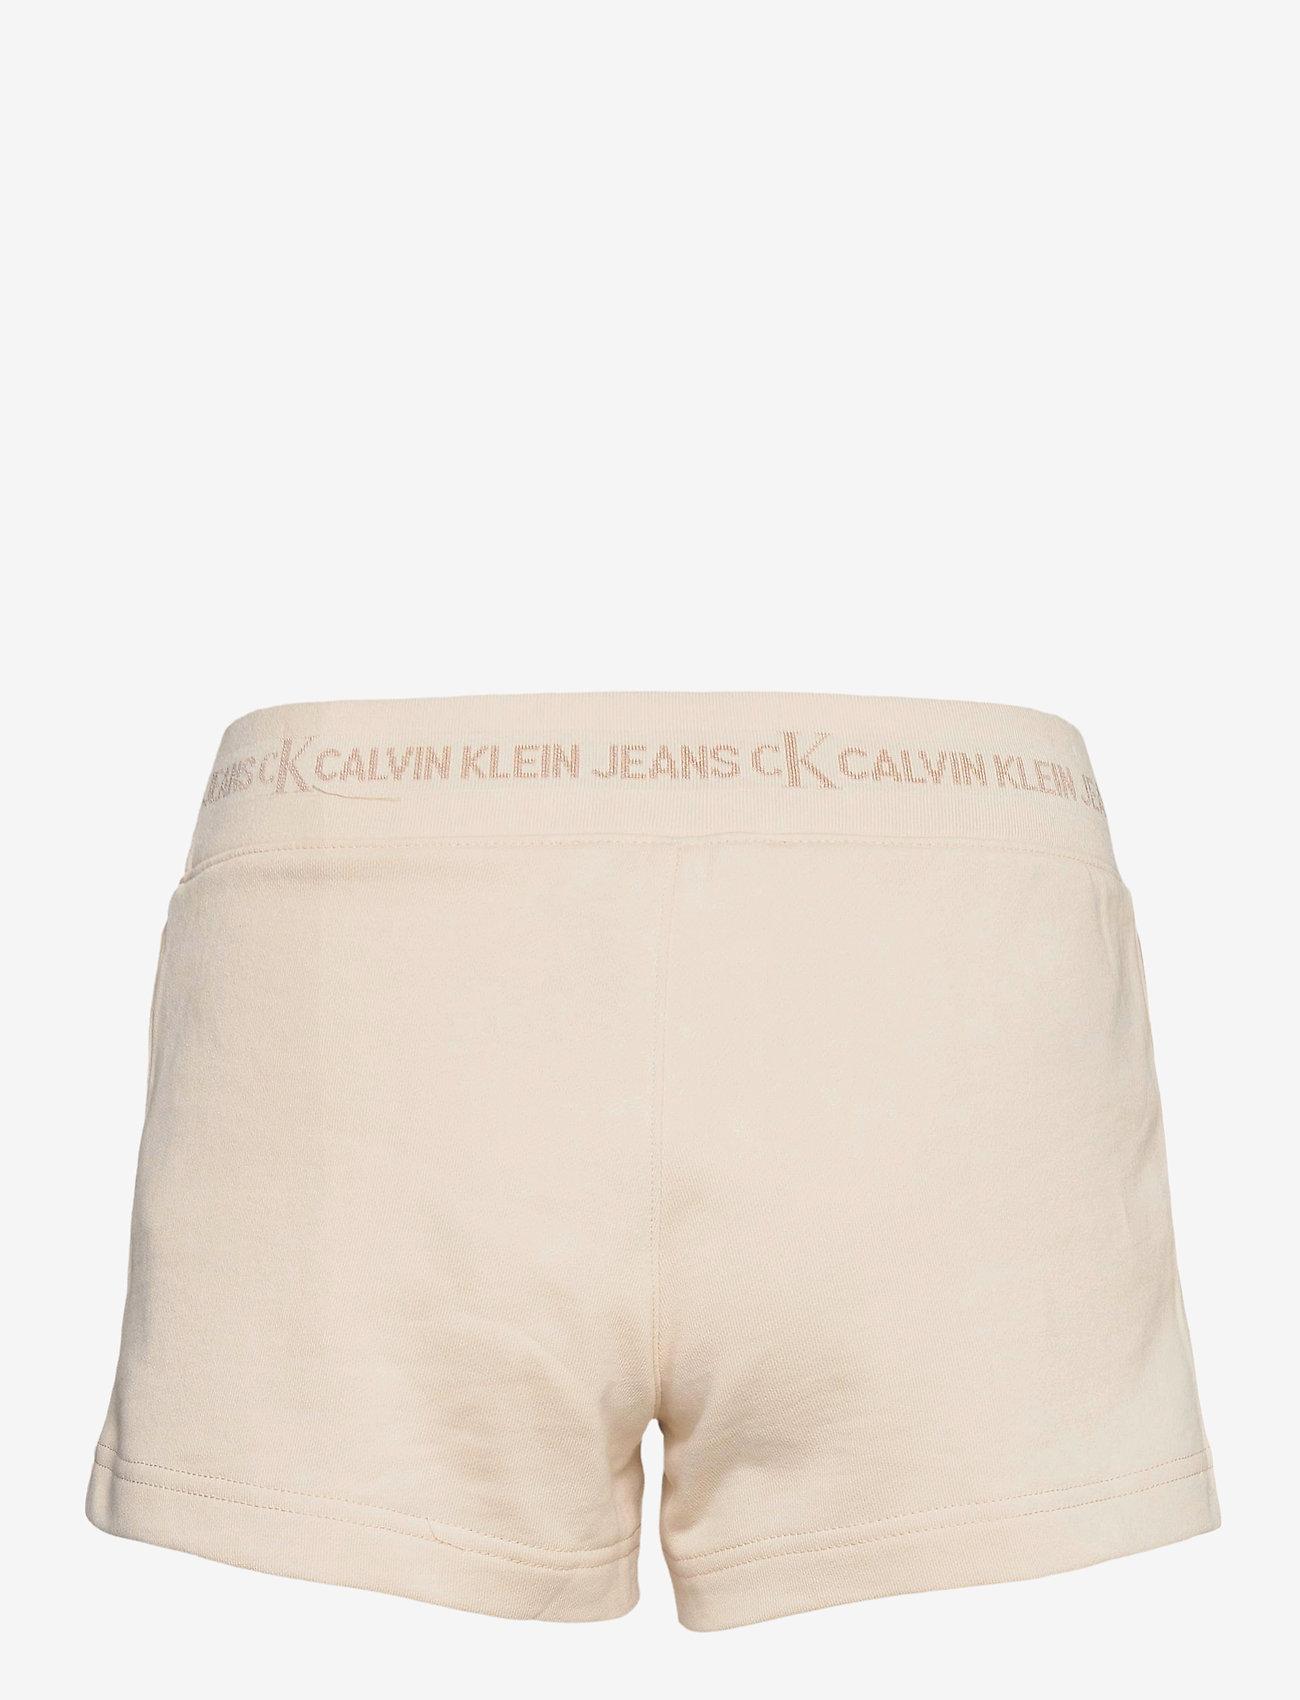 Calvin Klein Jeans - LOGO TRIM KNIT SHORT - casual shorts - white sand - 1